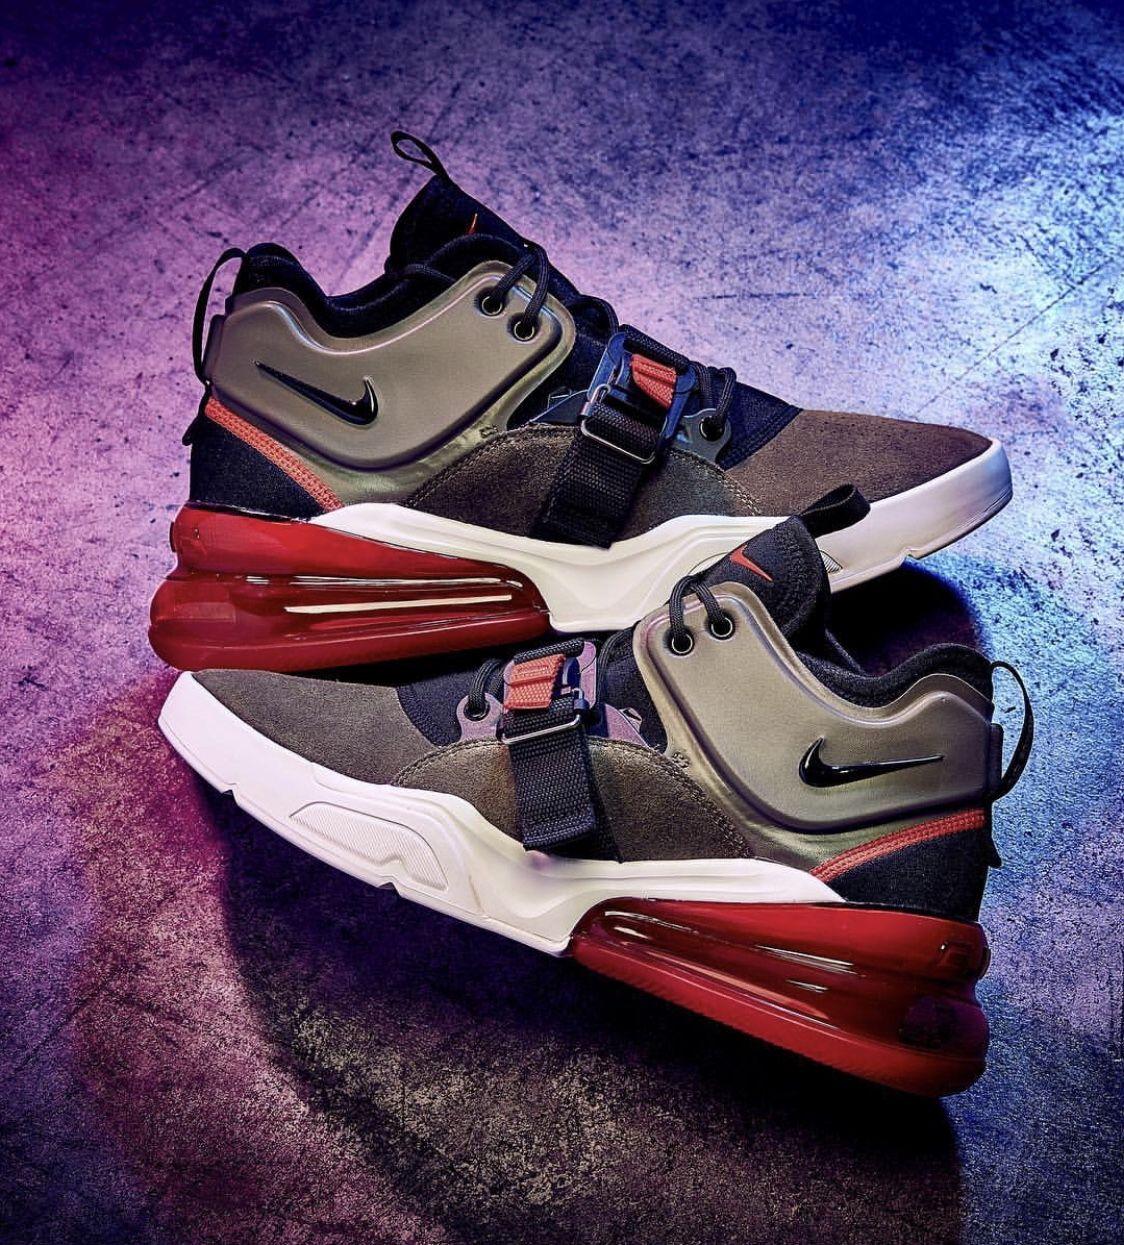 premium selection 6ec31 e8134 Nike Air Force 270 Zapatillas Deportivas, Zapatos Deportivos, Tenis Cano,  Deportes, Senda